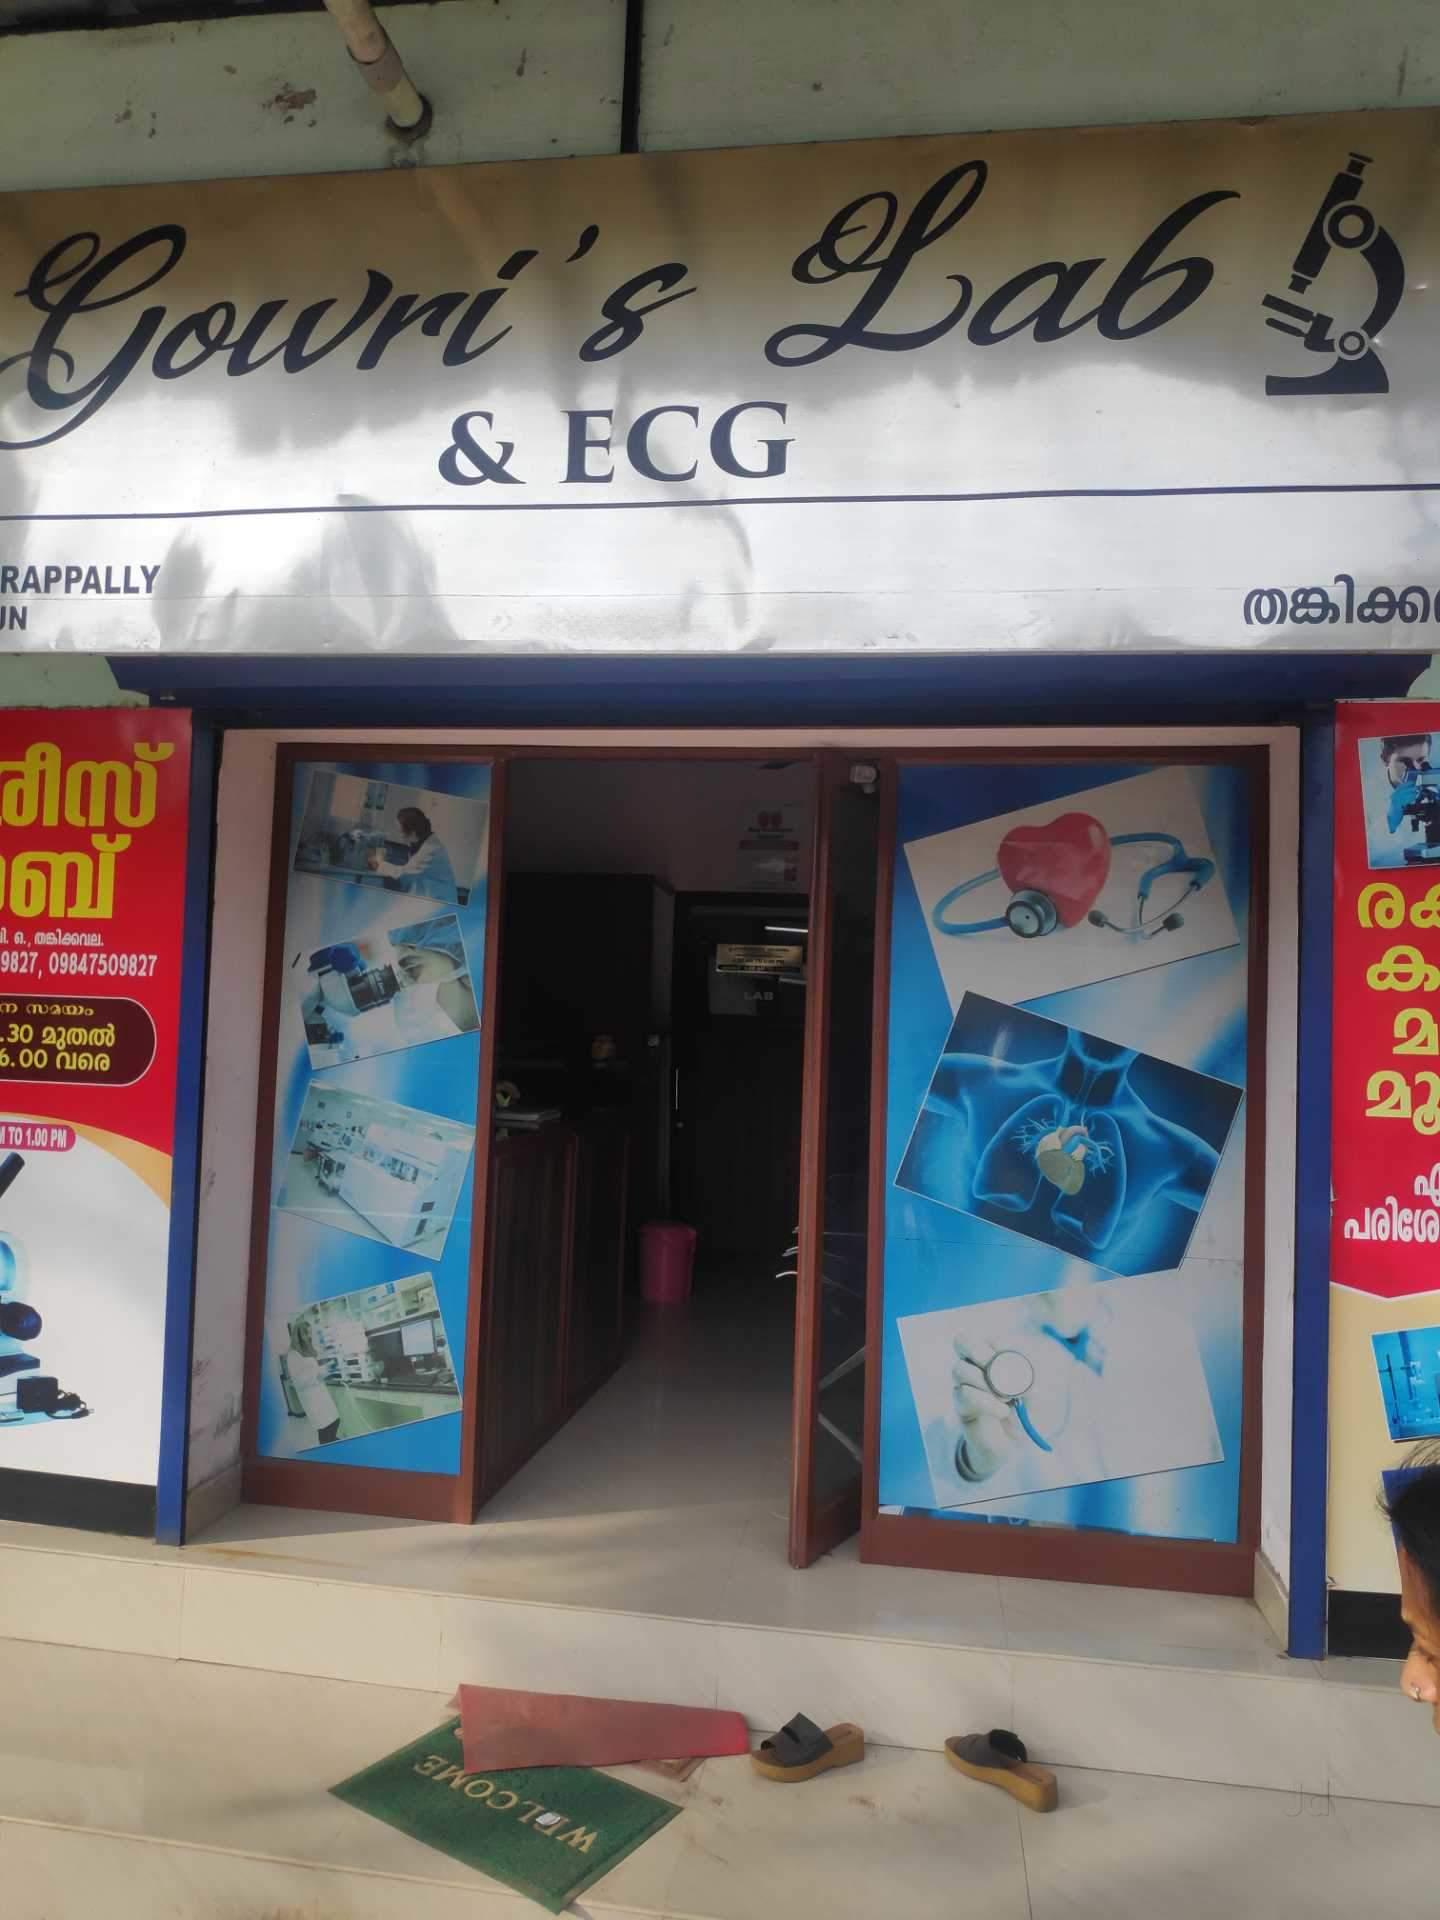 Gowri's Lab, LABORATORY,  service in Kadakkarappally, Alappuzha